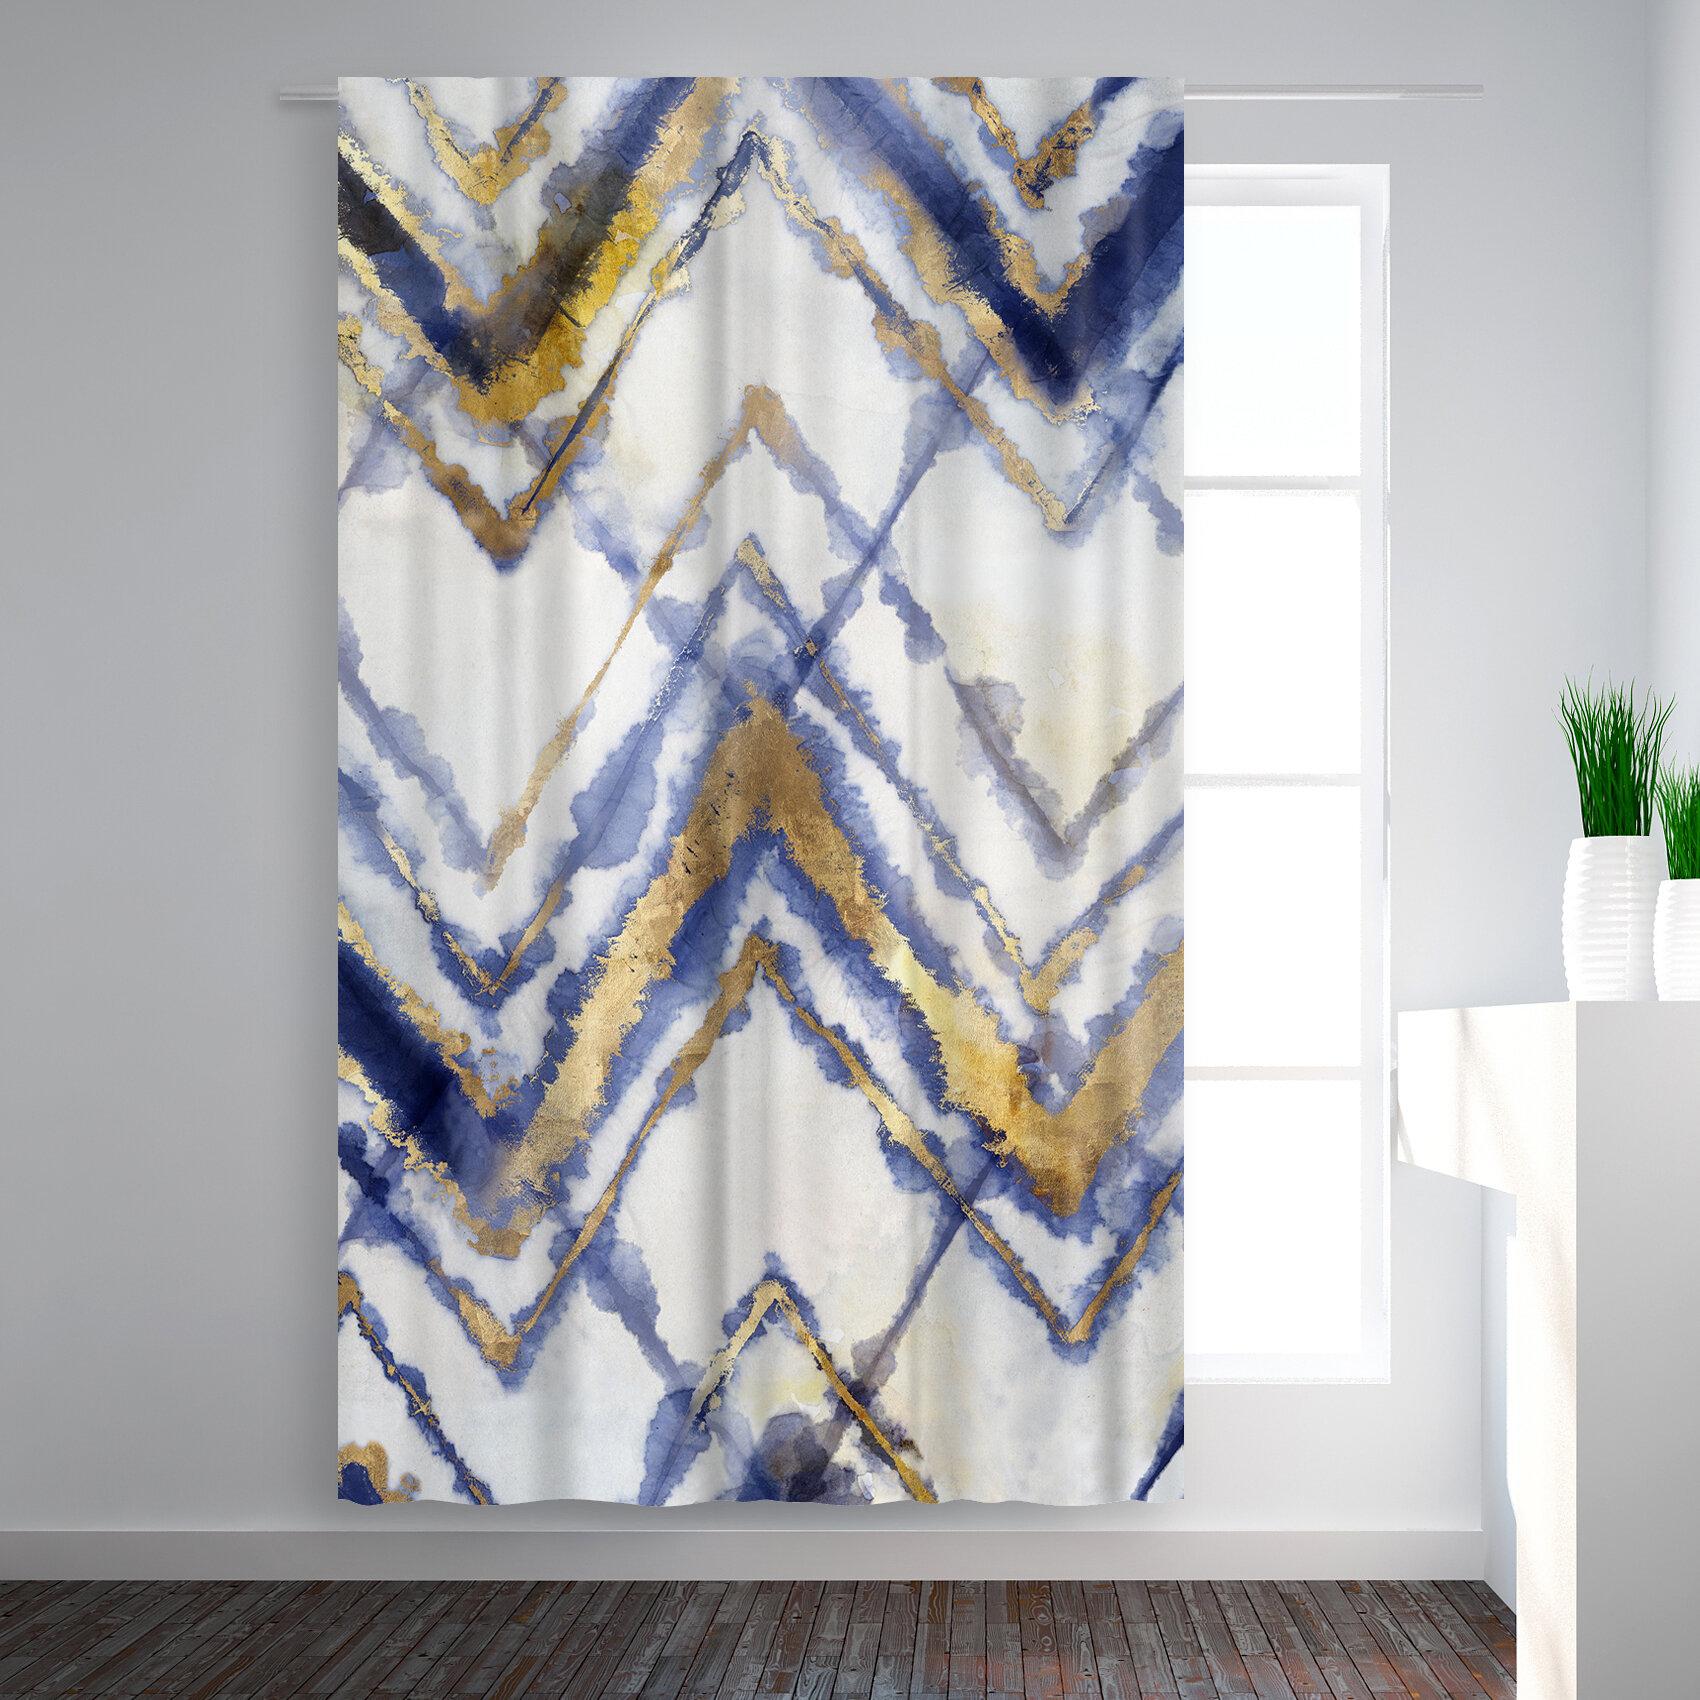 East Urban Home Pi Creative Art Tie Dye Iii Abstract Blackout Rod Pocket Single Curtain Panel Wayfair